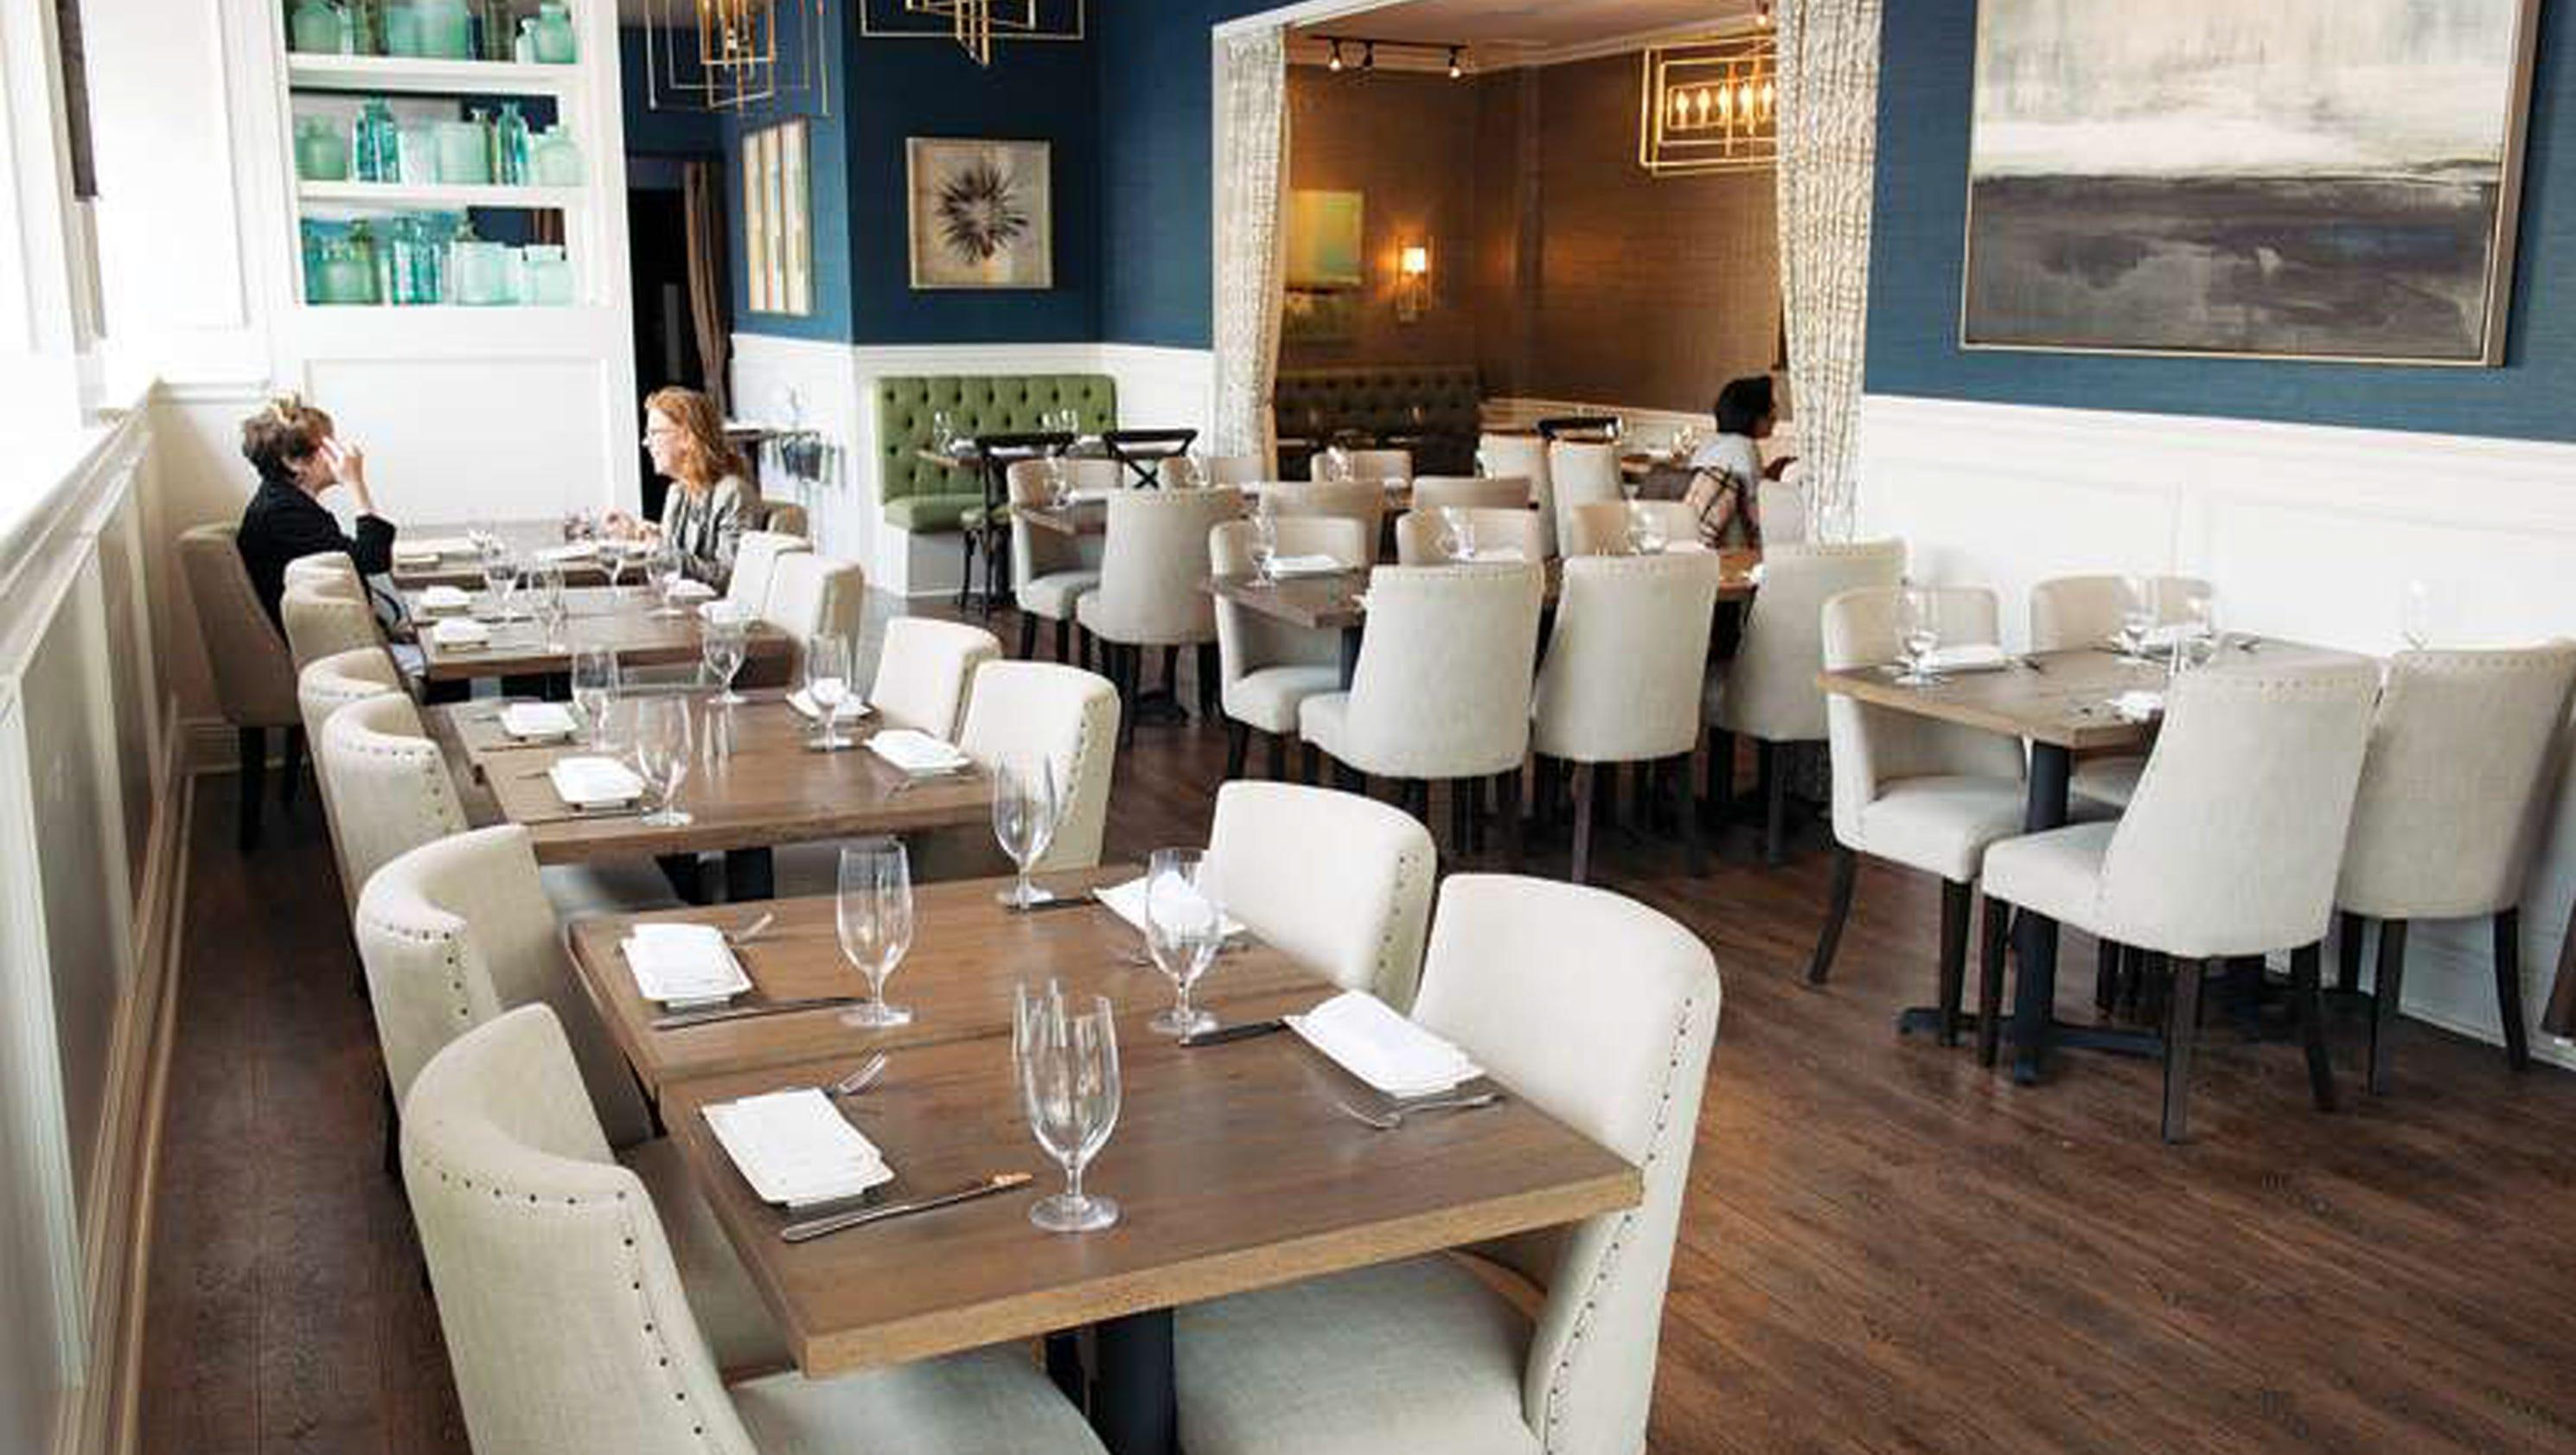 Novo In Ridgewood Is No More Its Stead Brasserie De